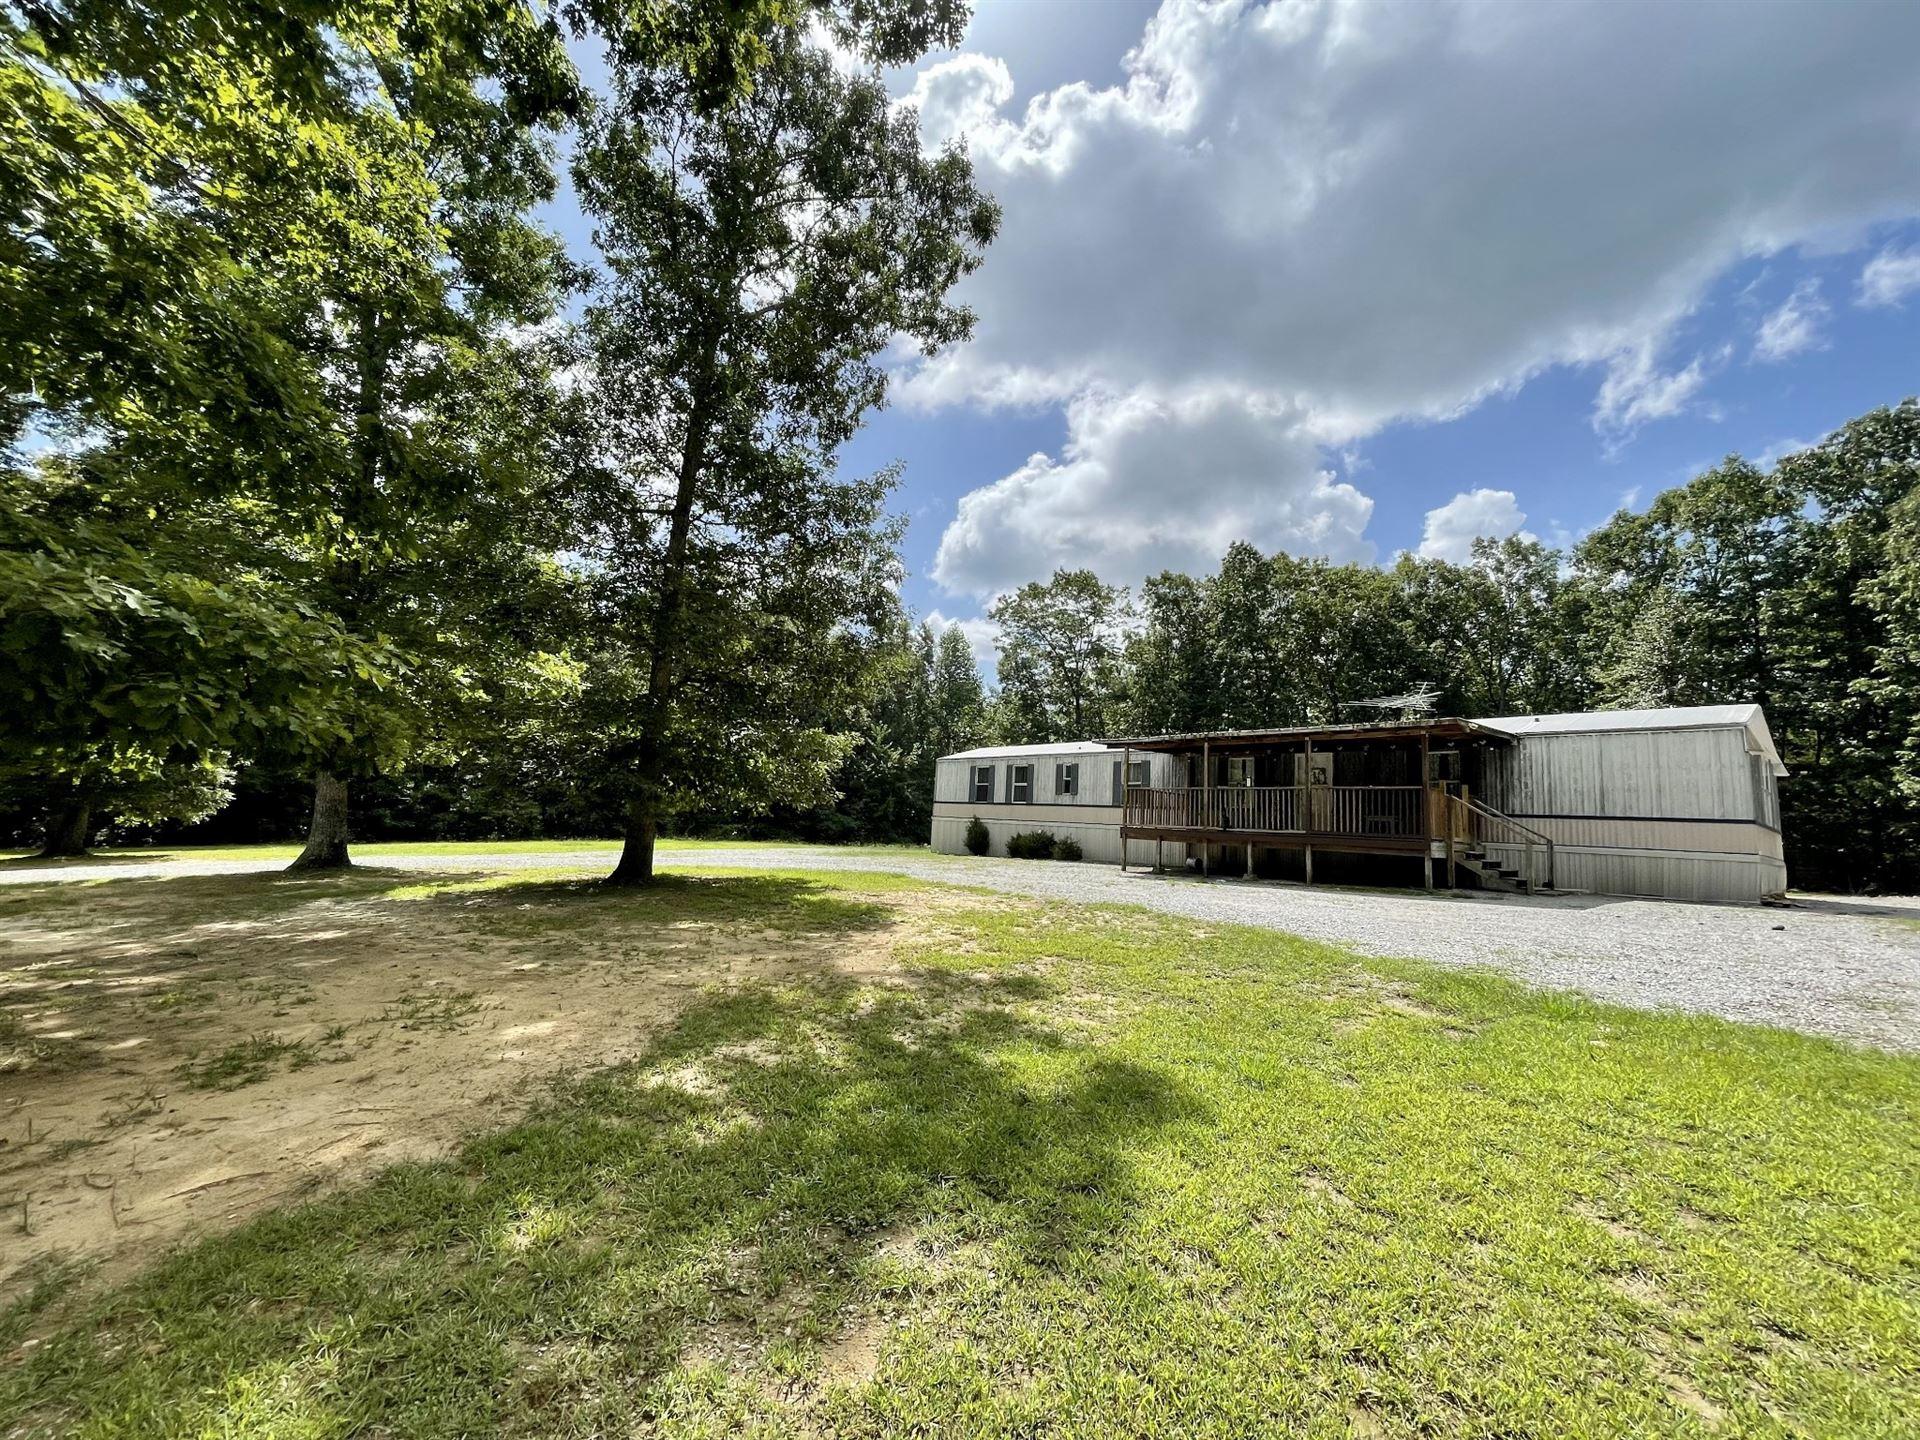 264 McBain Rd, Altamont, TN 37301 - MLS#: 2286062